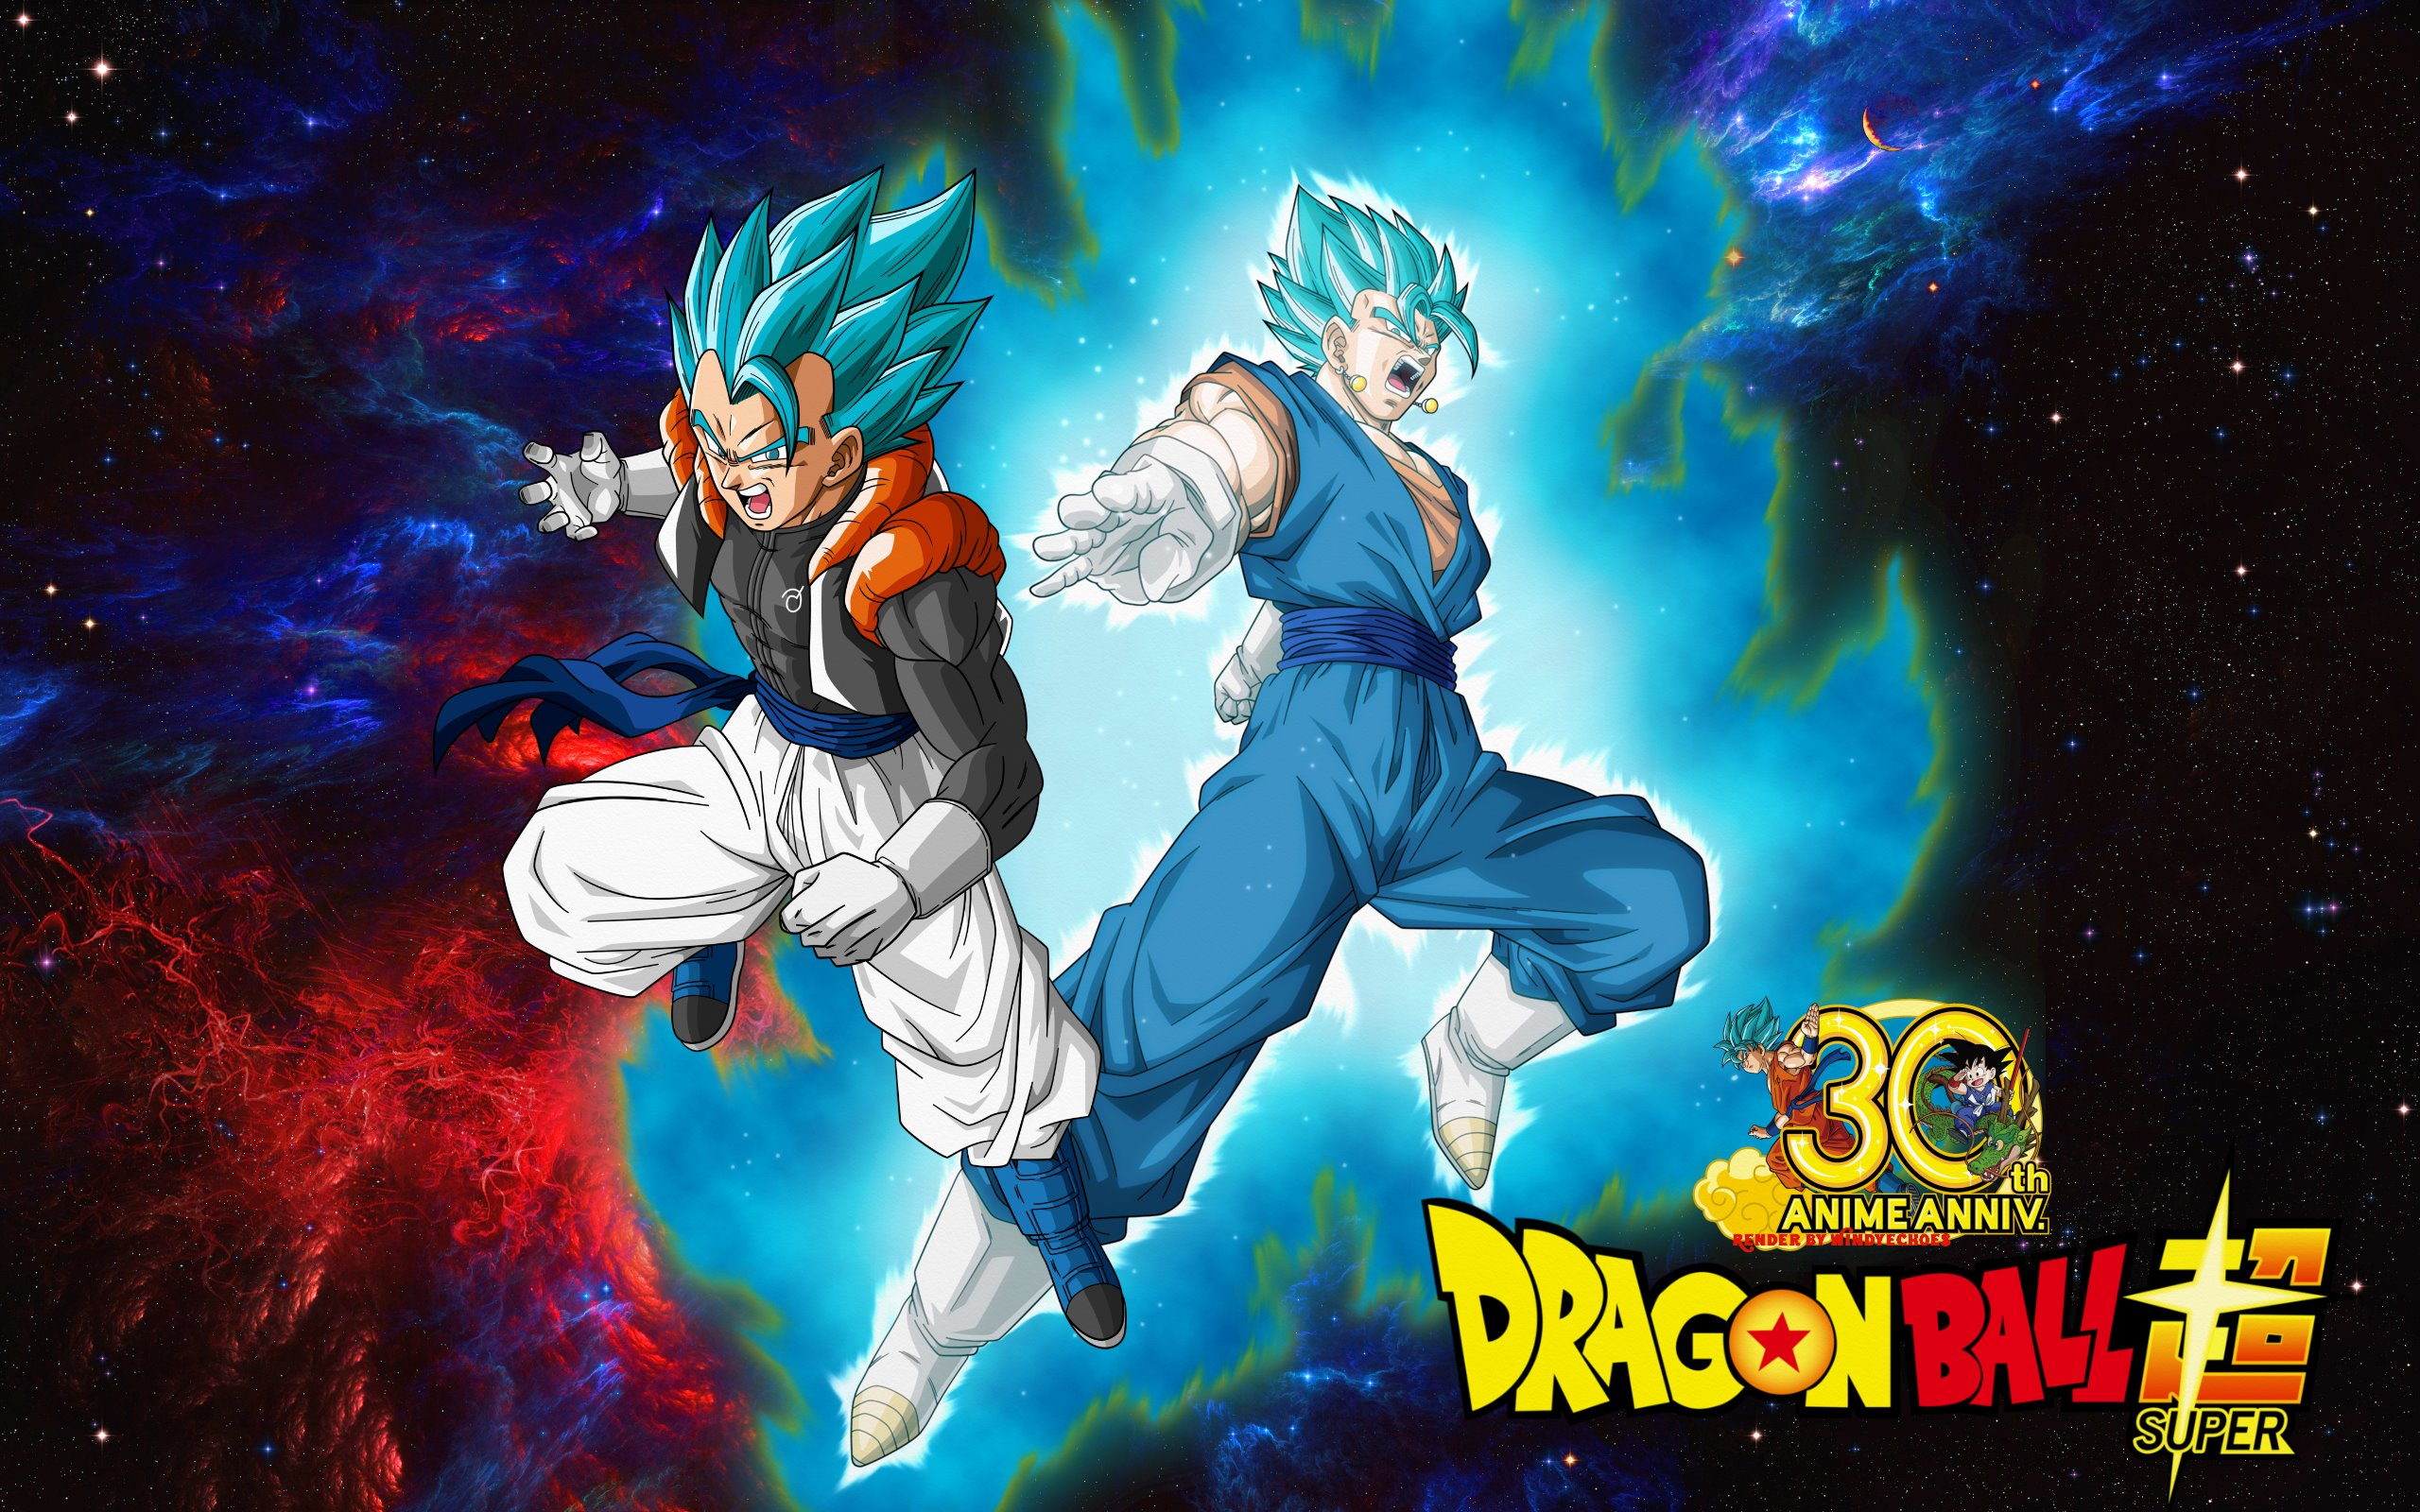 Super Saiyan Live Wallpaper Iphone X Dragon Ball Super Full Hd Wallpaper And Background